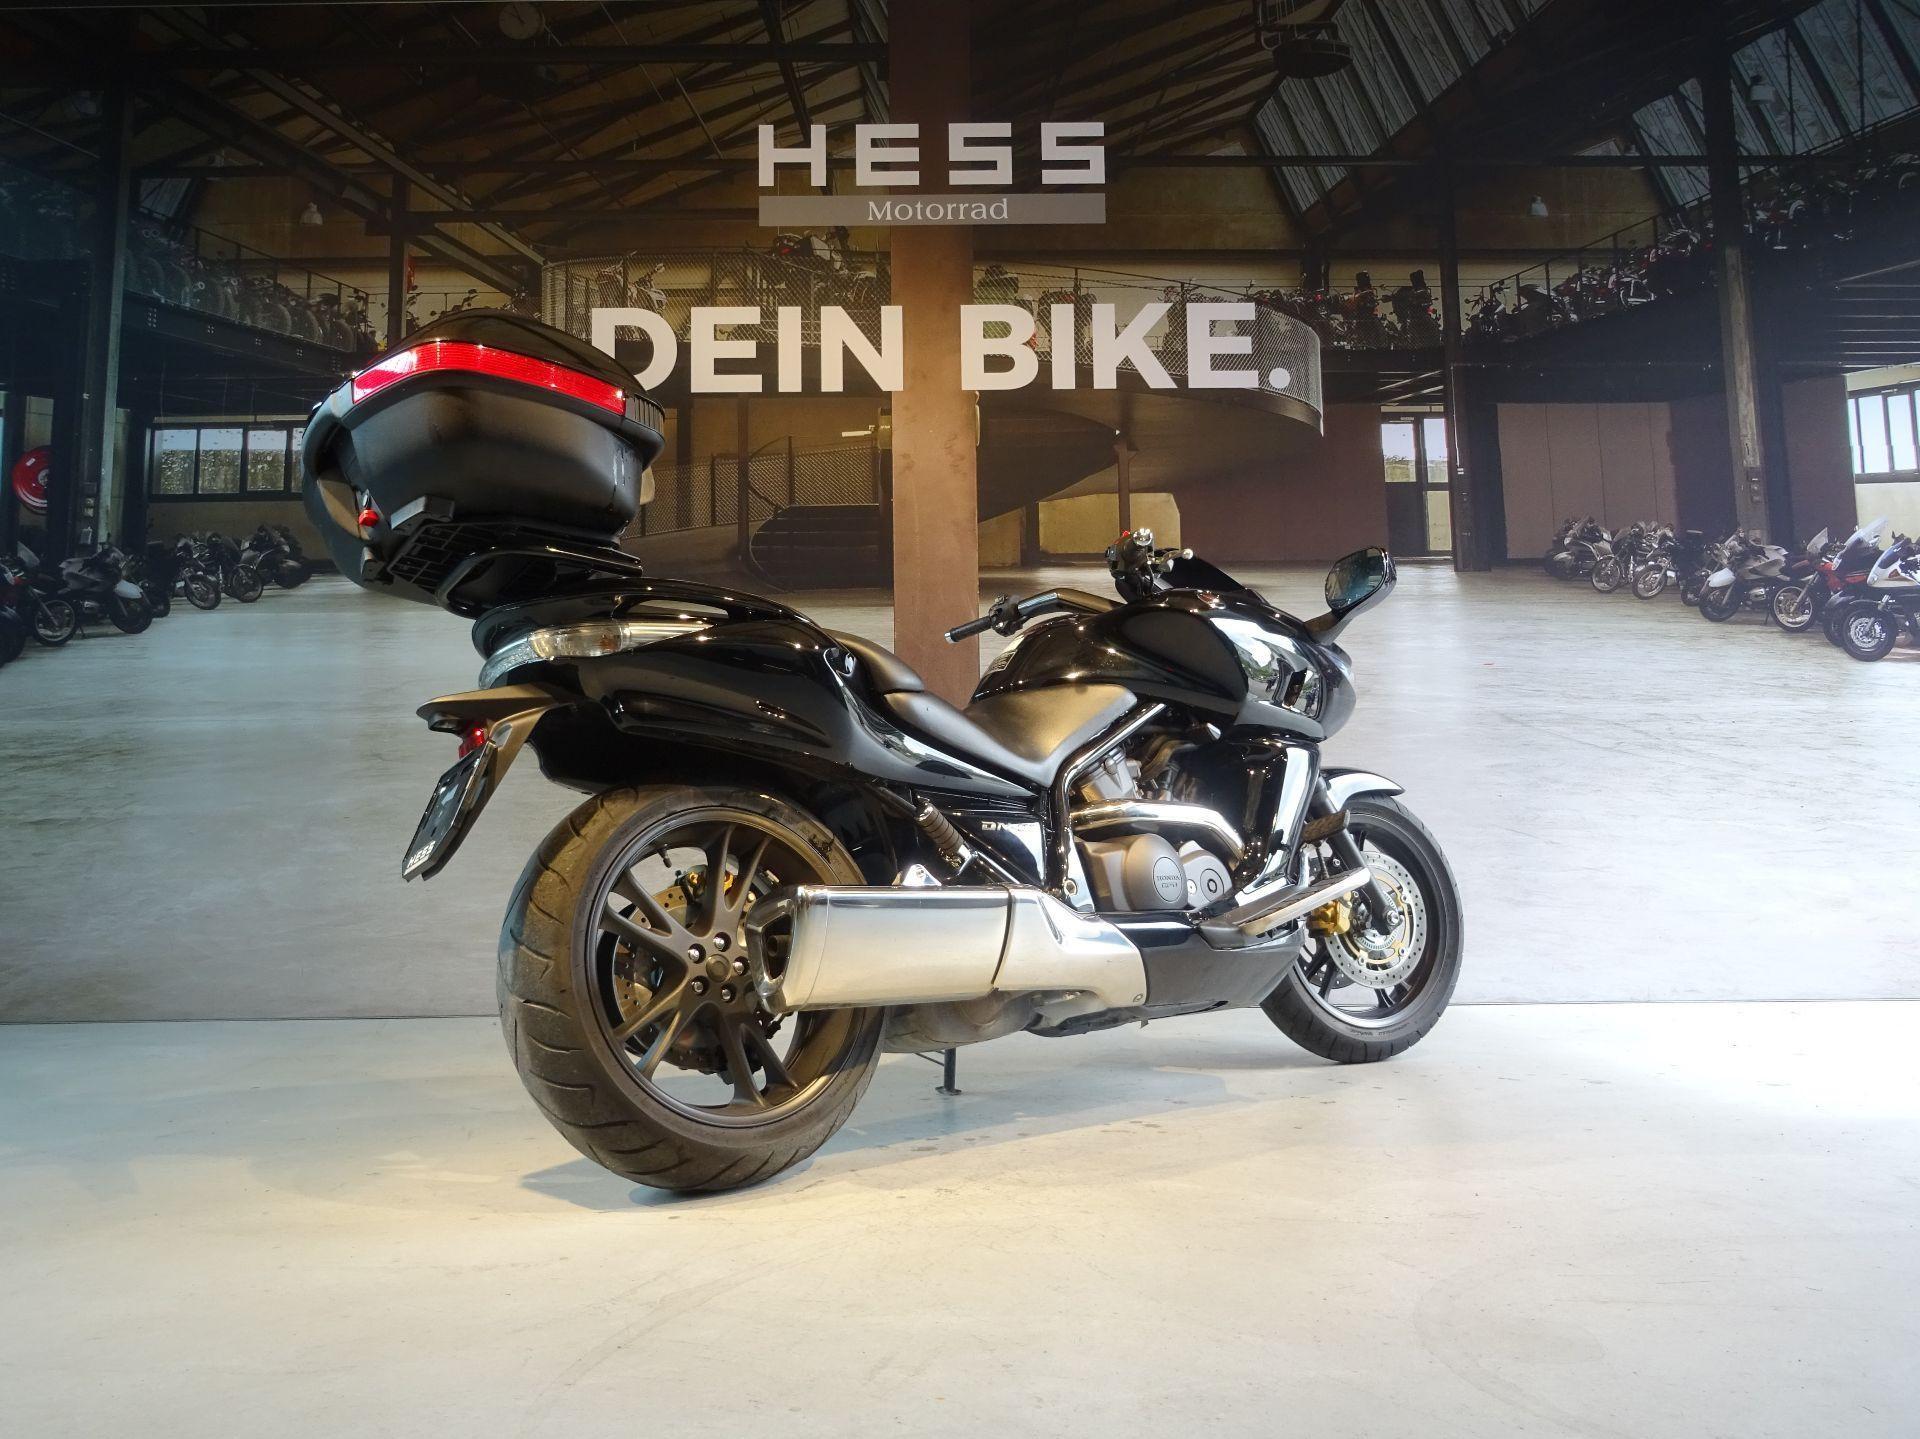 moto occasions acheter honda nsa 700 a dn 01 abs hess motorrad stettlen. Black Bedroom Furniture Sets. Home Design Ideas